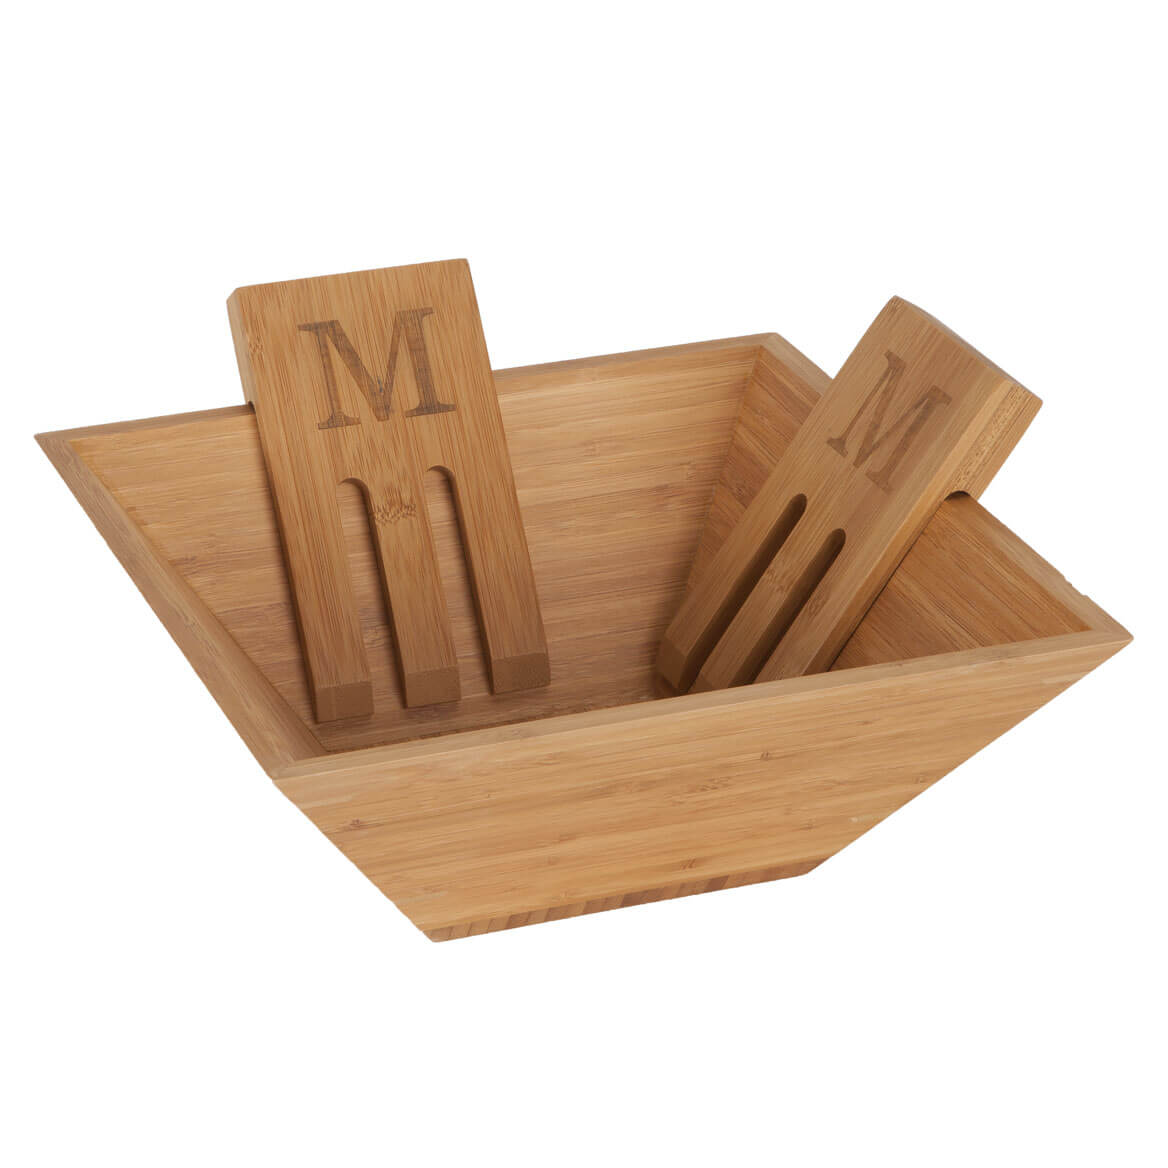 Personalized 3pc Bamboo Salad Bowl Set